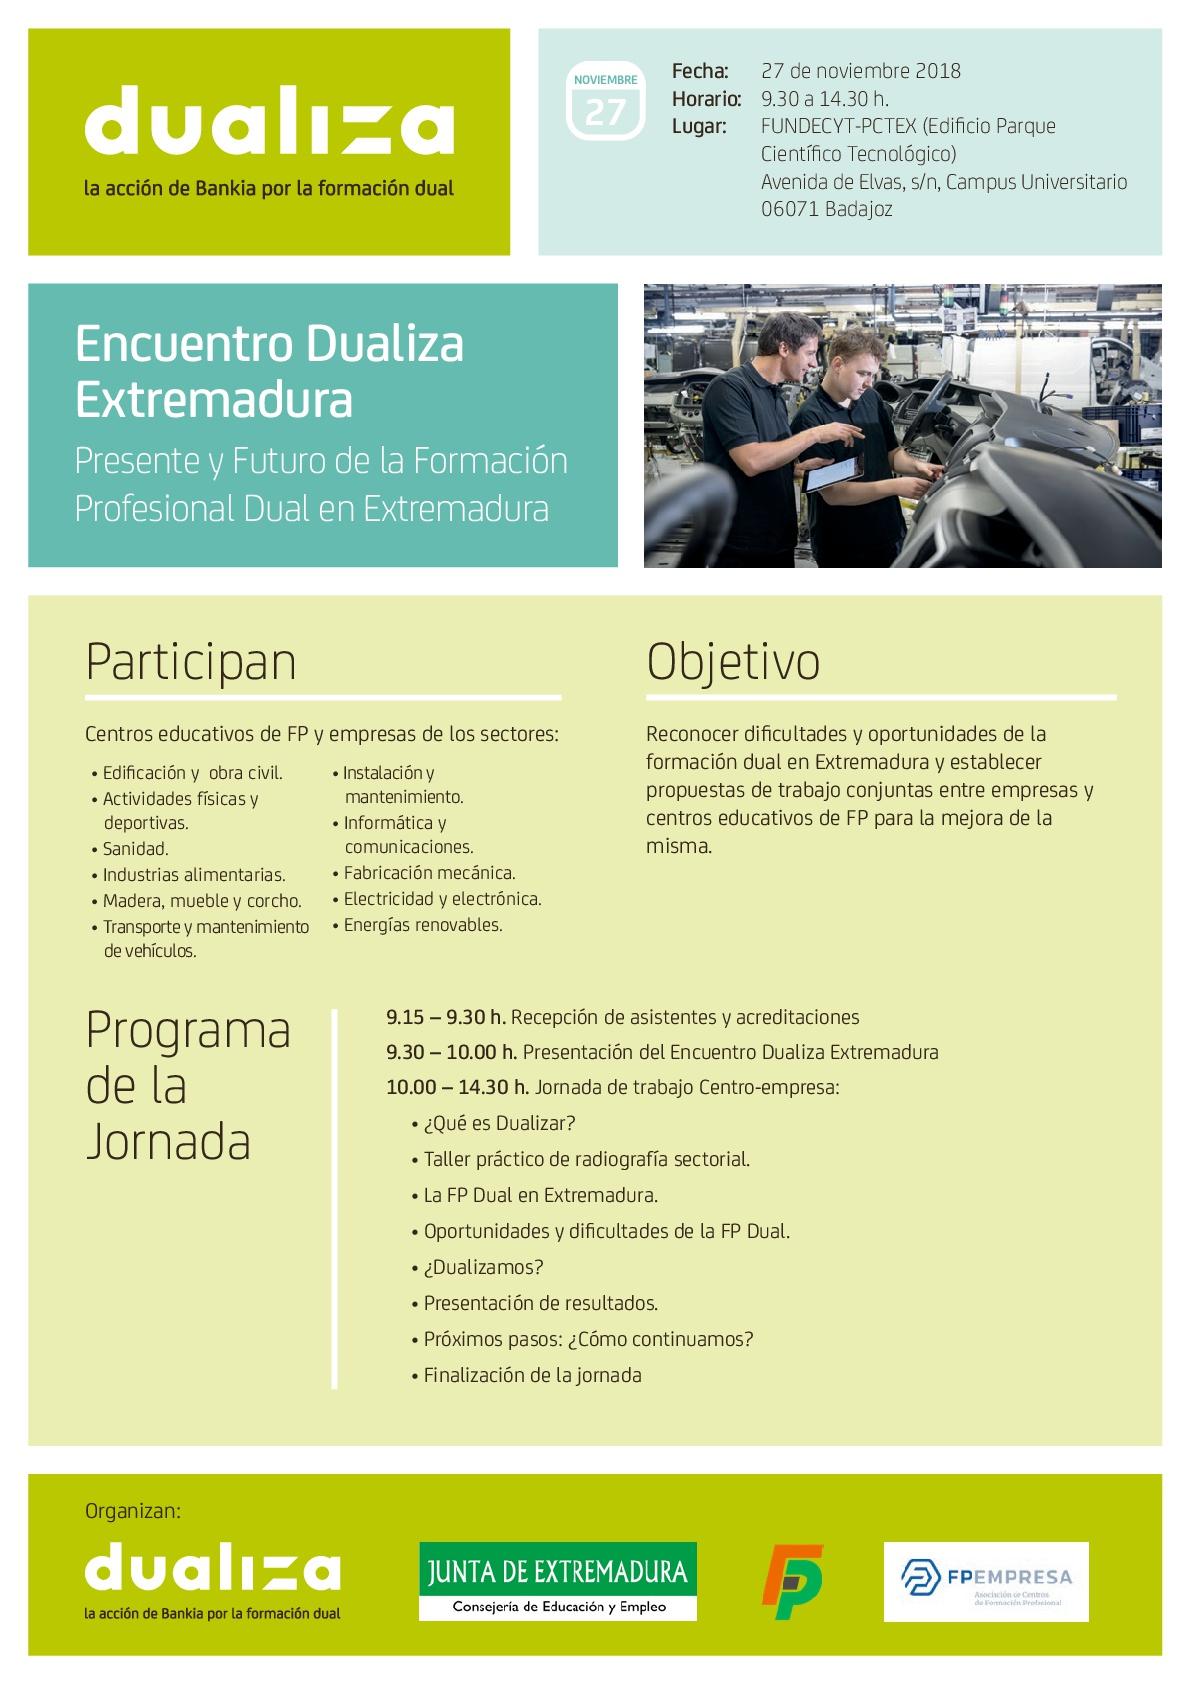 invitacionExtremadura 001